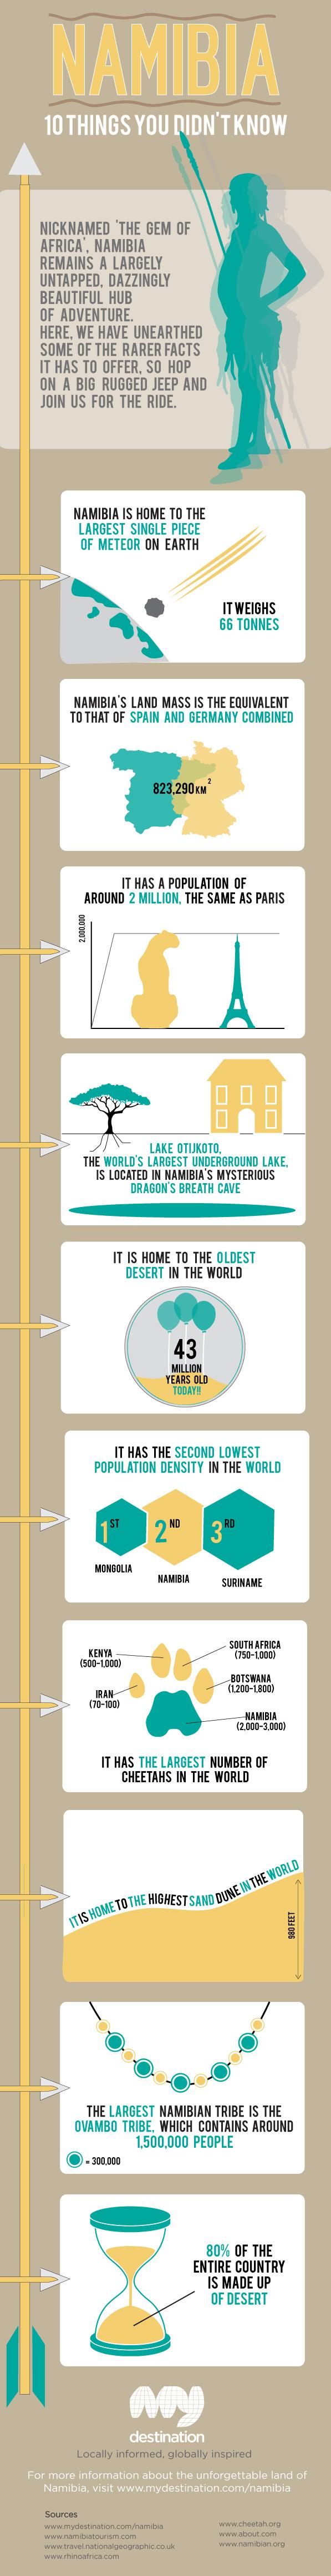 Destination Namibia-Infographic